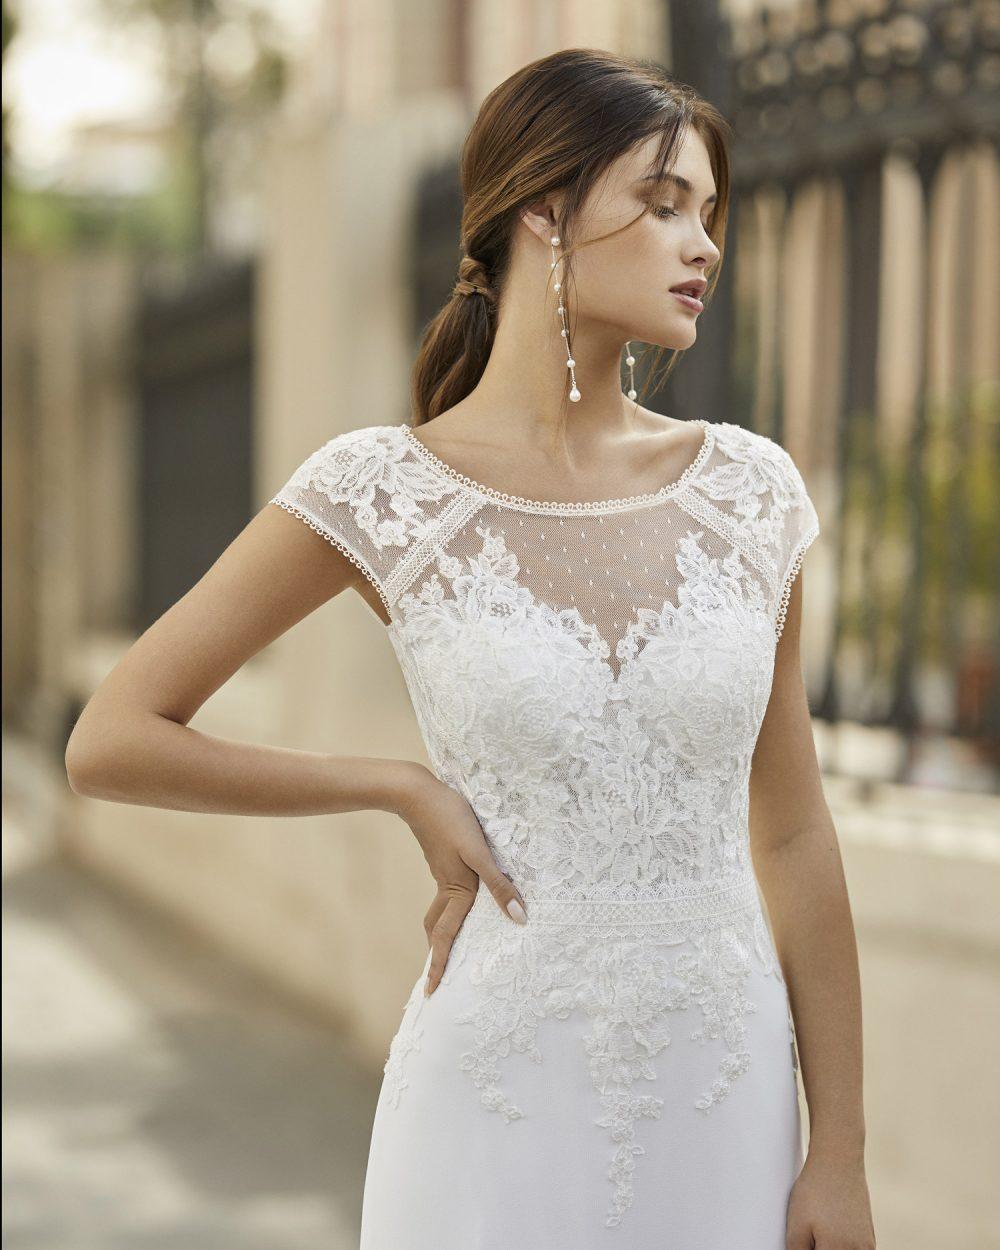 Mariages: abito da sposa Rosa Clarà 2021 a Vicenza, Verona, Padova, Veneto 5A120 TAROT